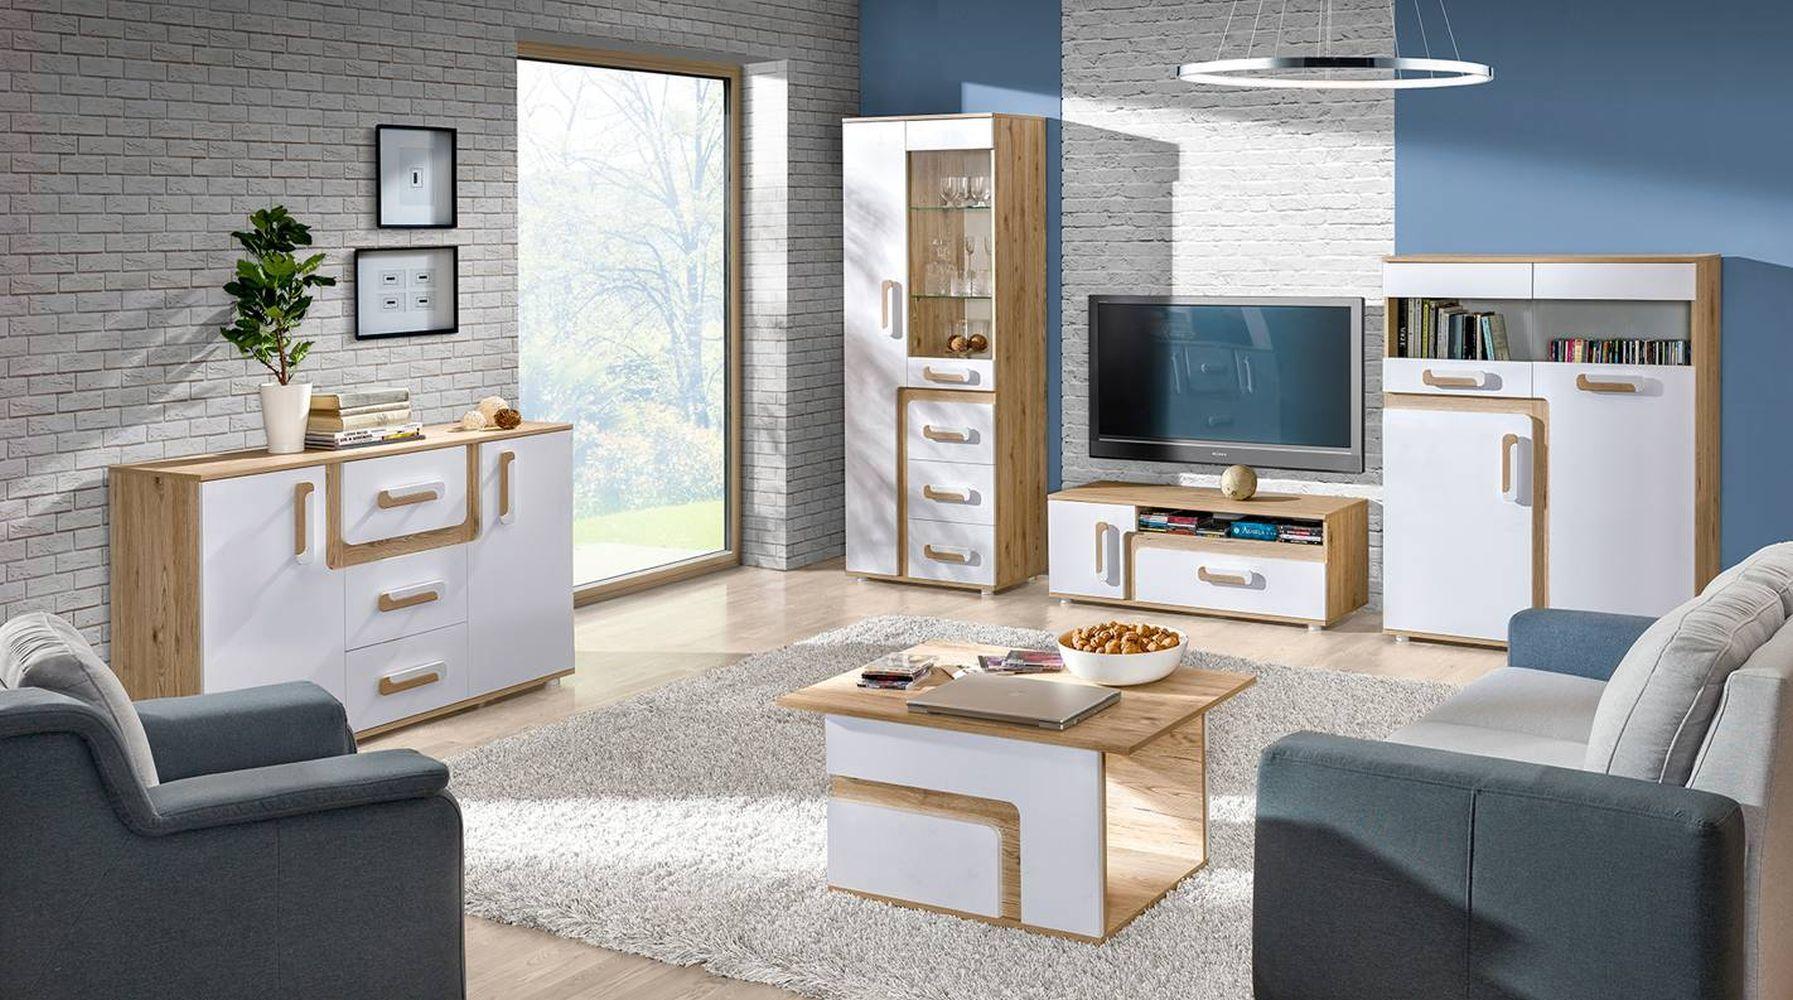 Wohnzimmer Komplett - Set E Oskar, 5-teilig, Farbe: Eiche Hellbraun / Weiß